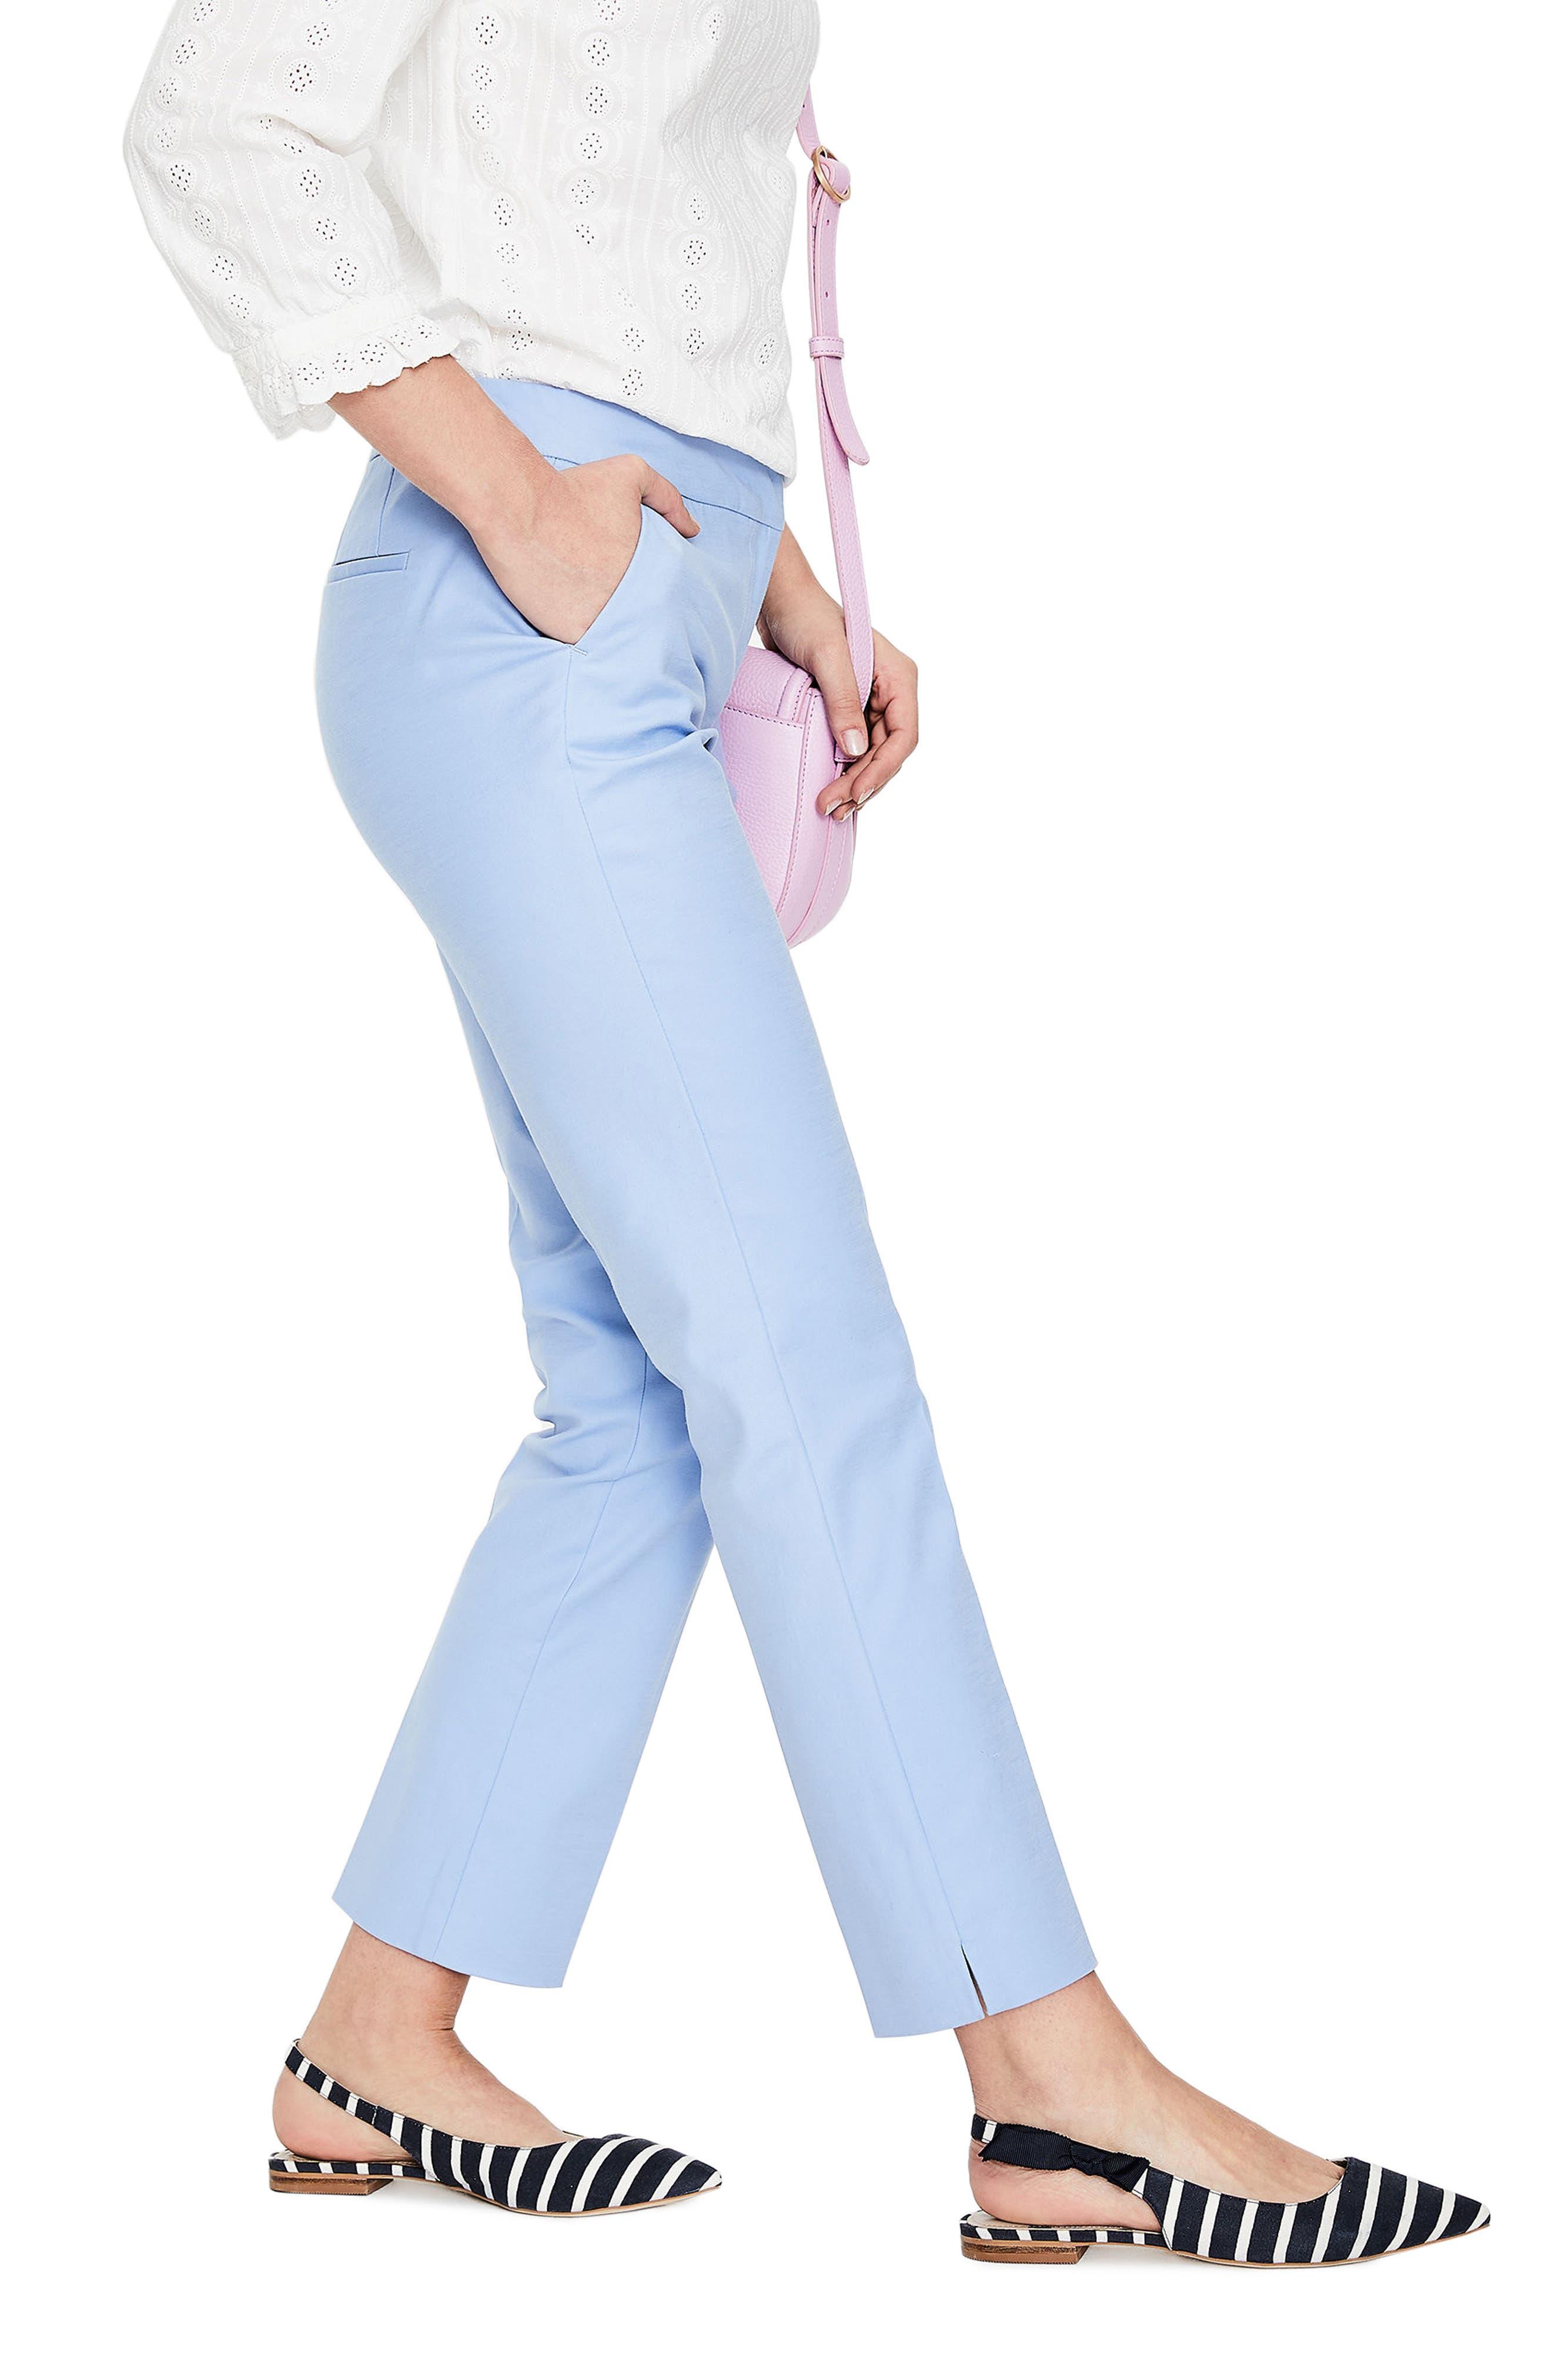 Richmond Polka Dot Stripe Contrast Ankle Pants,                         Main,                         color, HAZY BLUE